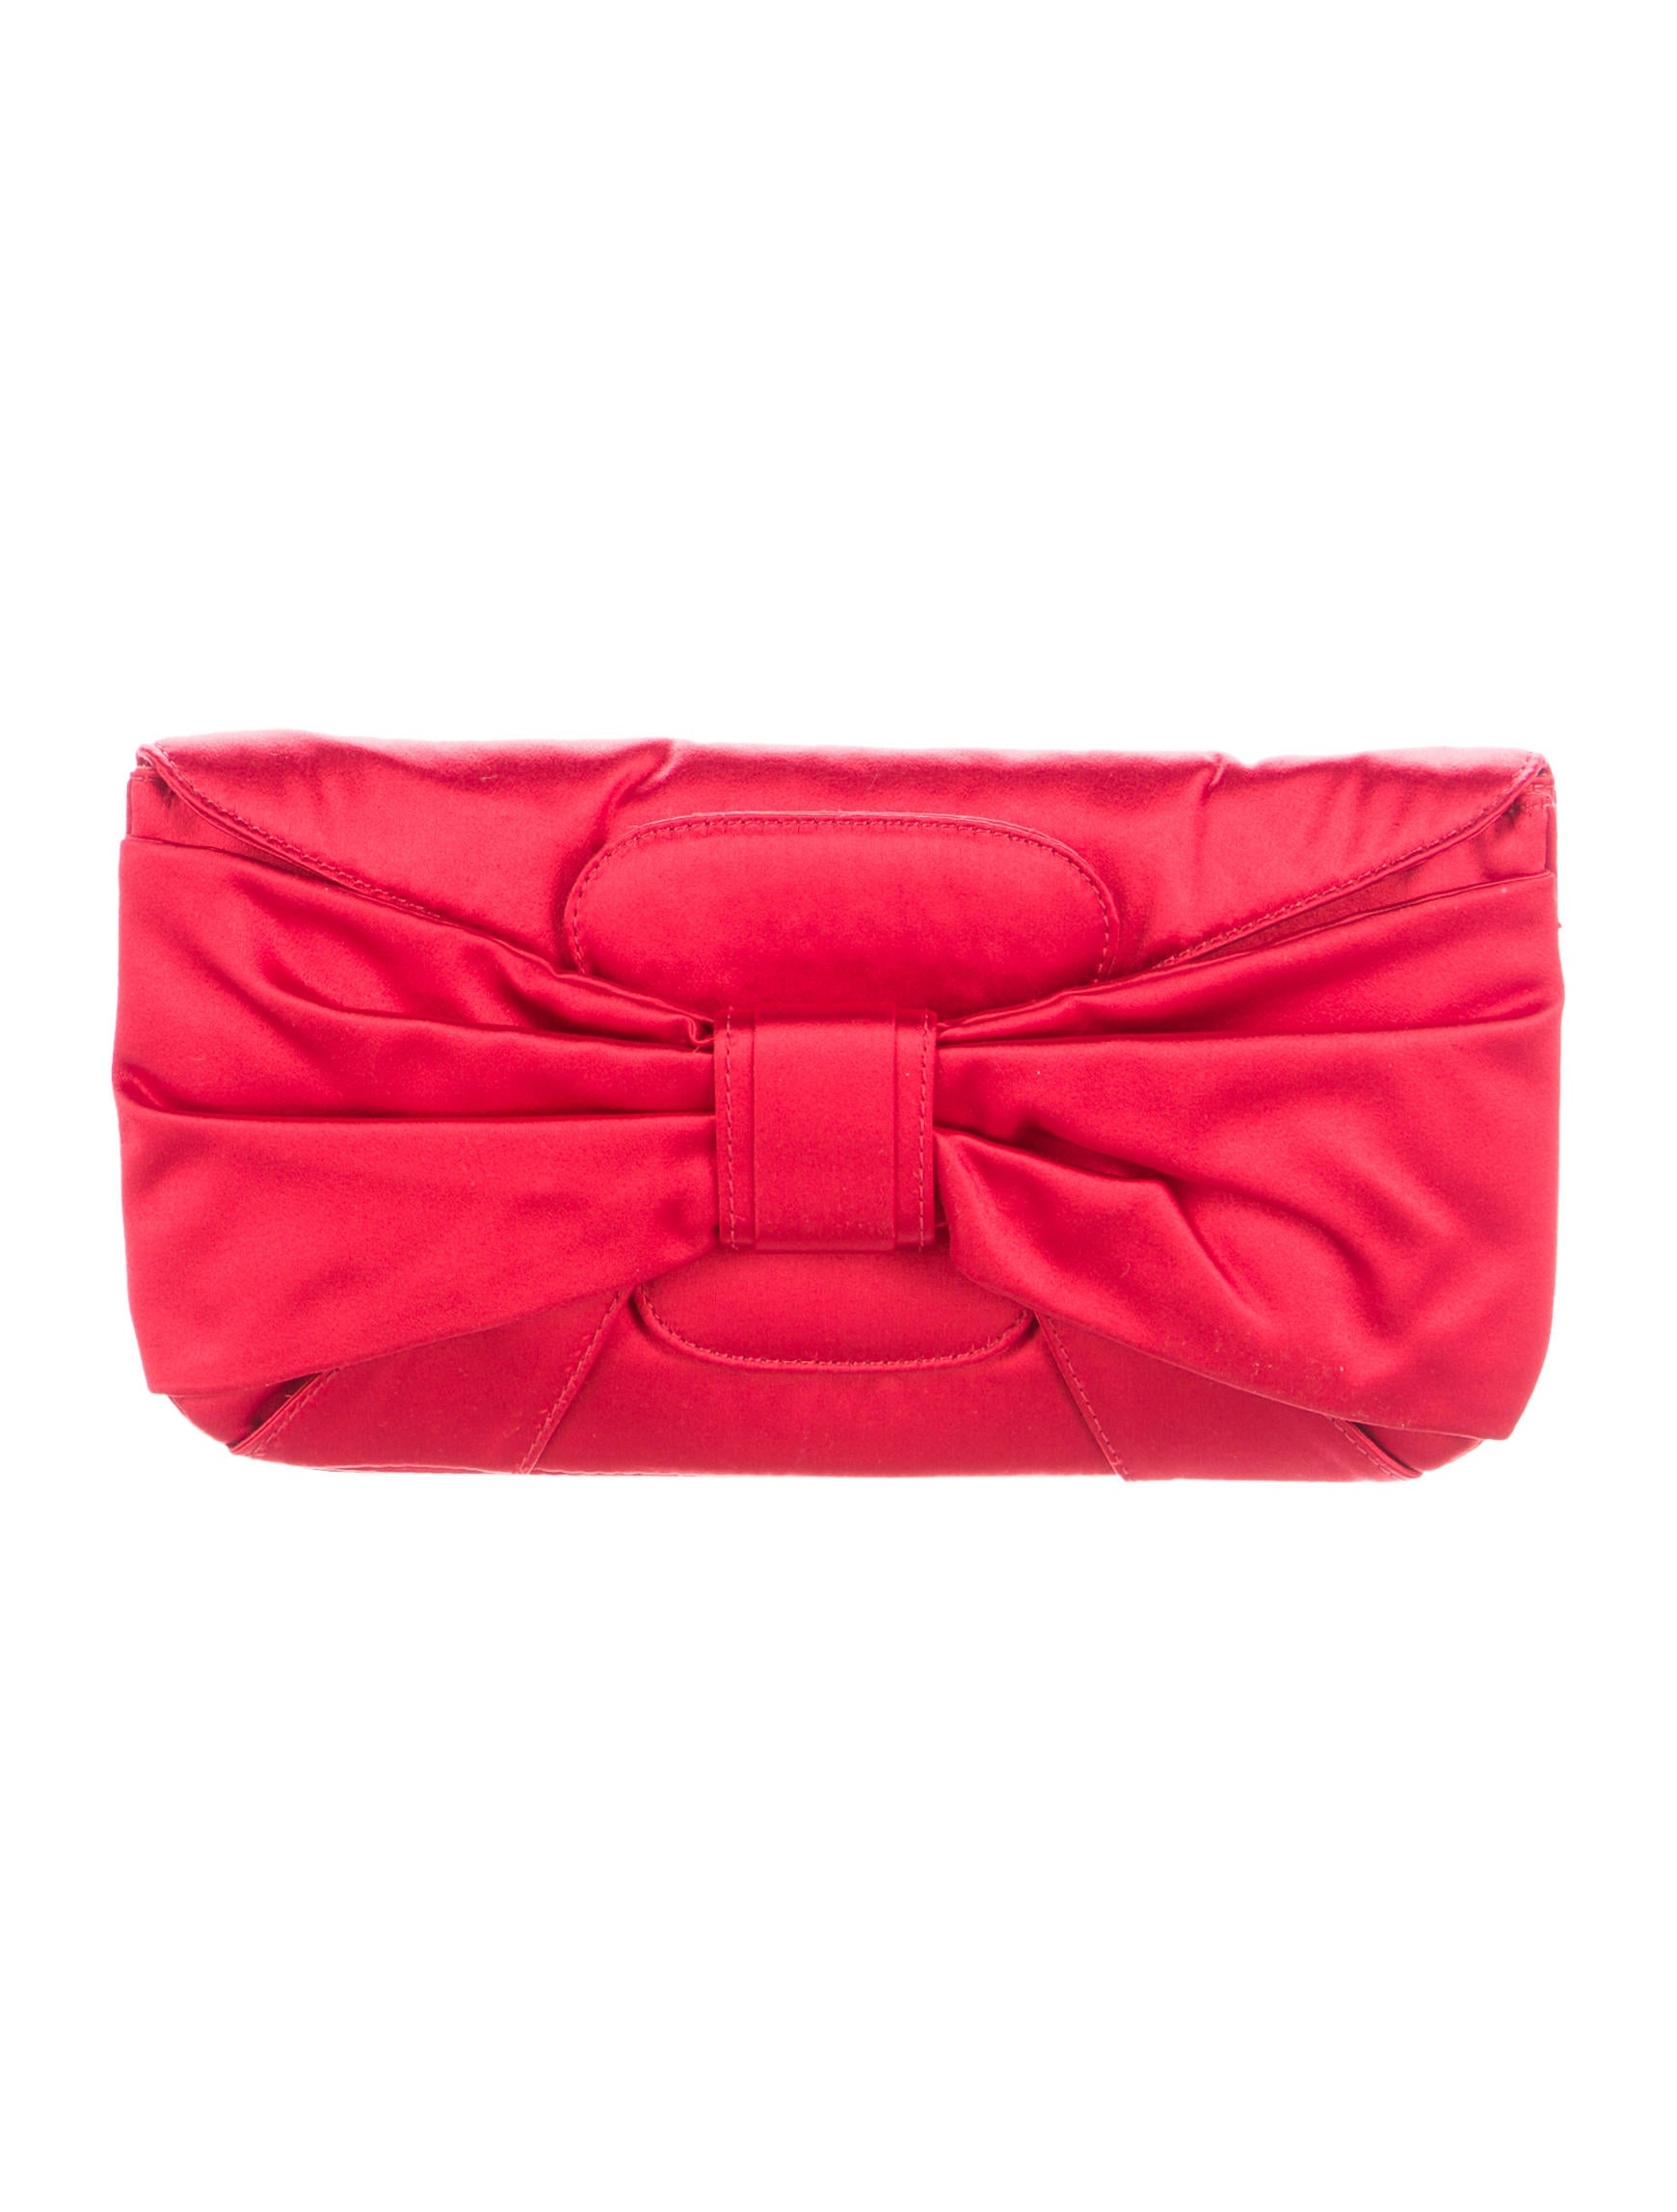 Valentino Satin Bow Clutch - Handbags - VAL69945 | The RealReal